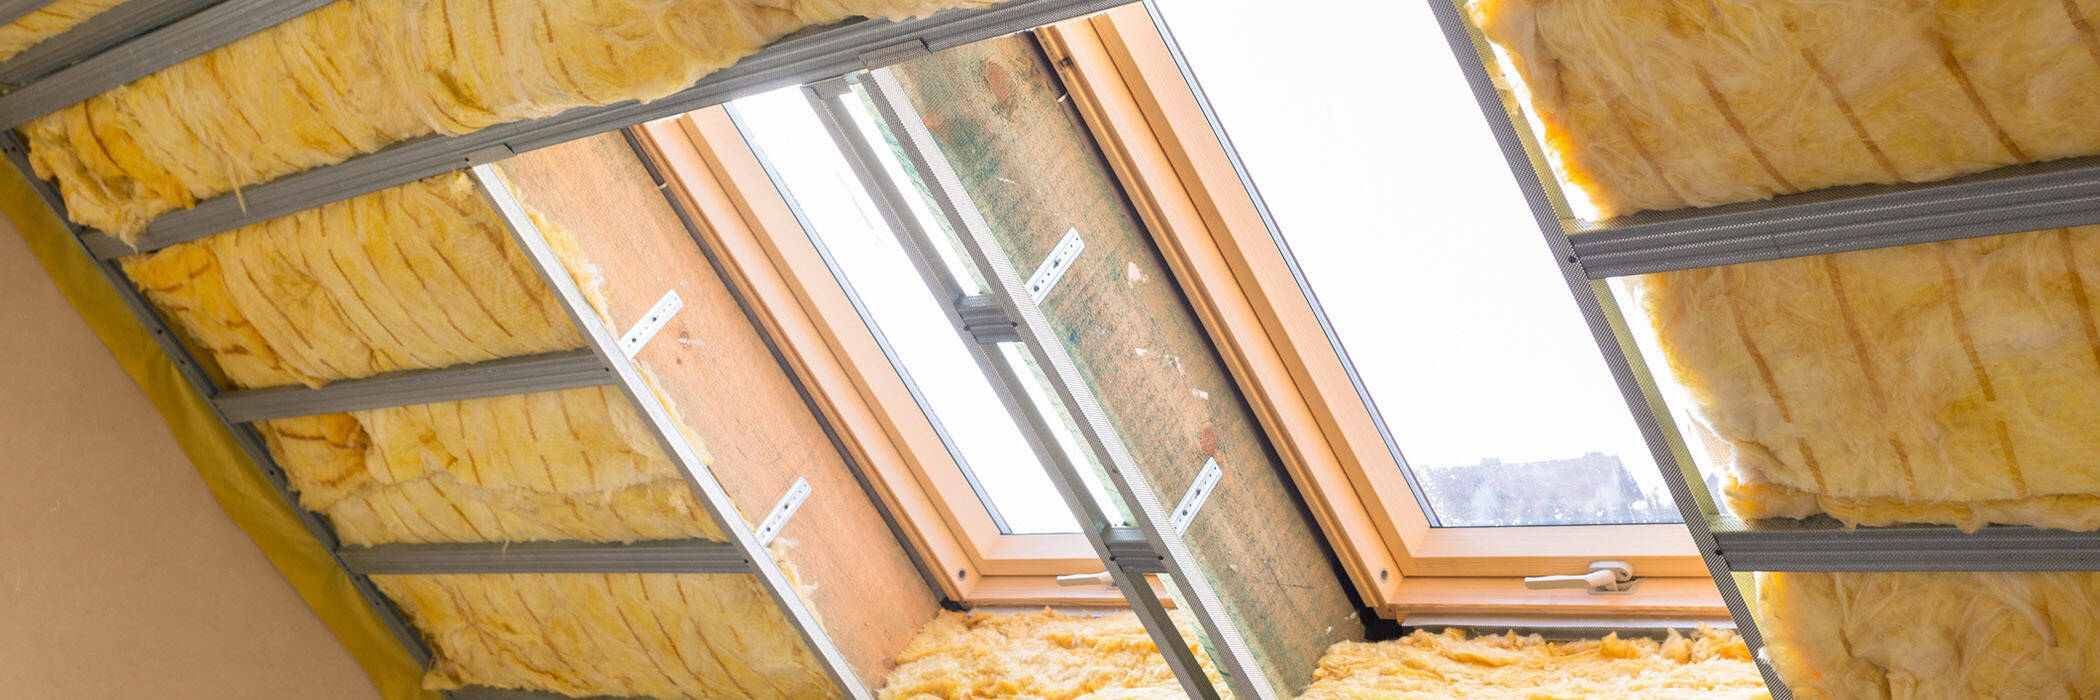 Man installing insulation.